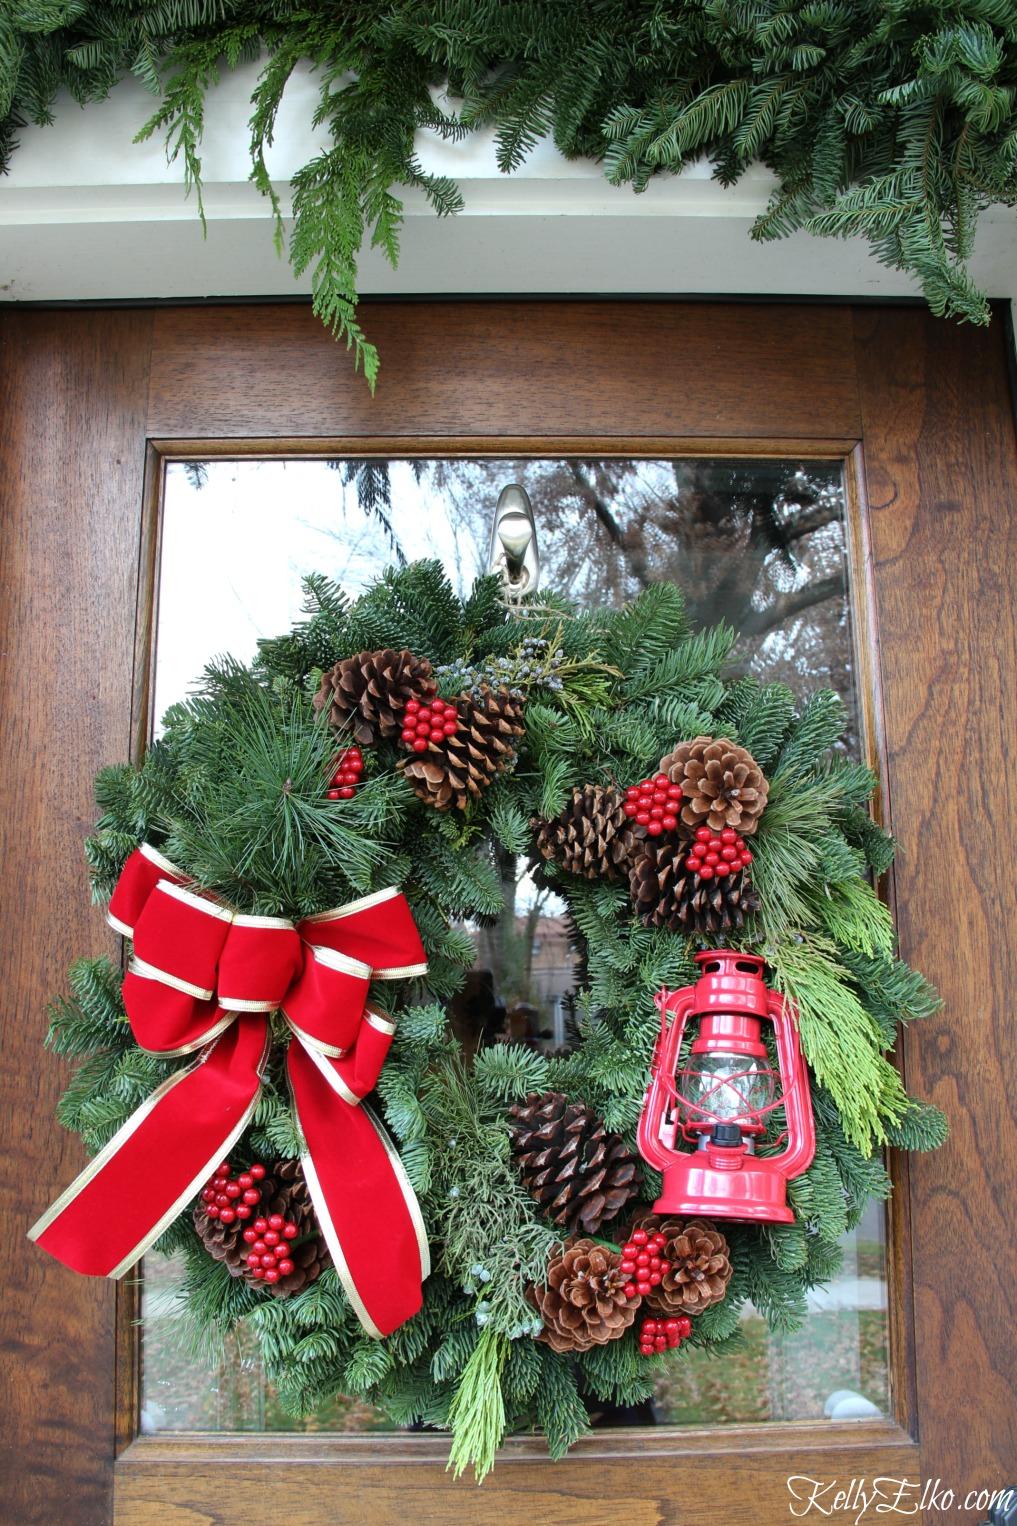 Red lantern Christmas wreath on this beautiful front door kellyelko.com